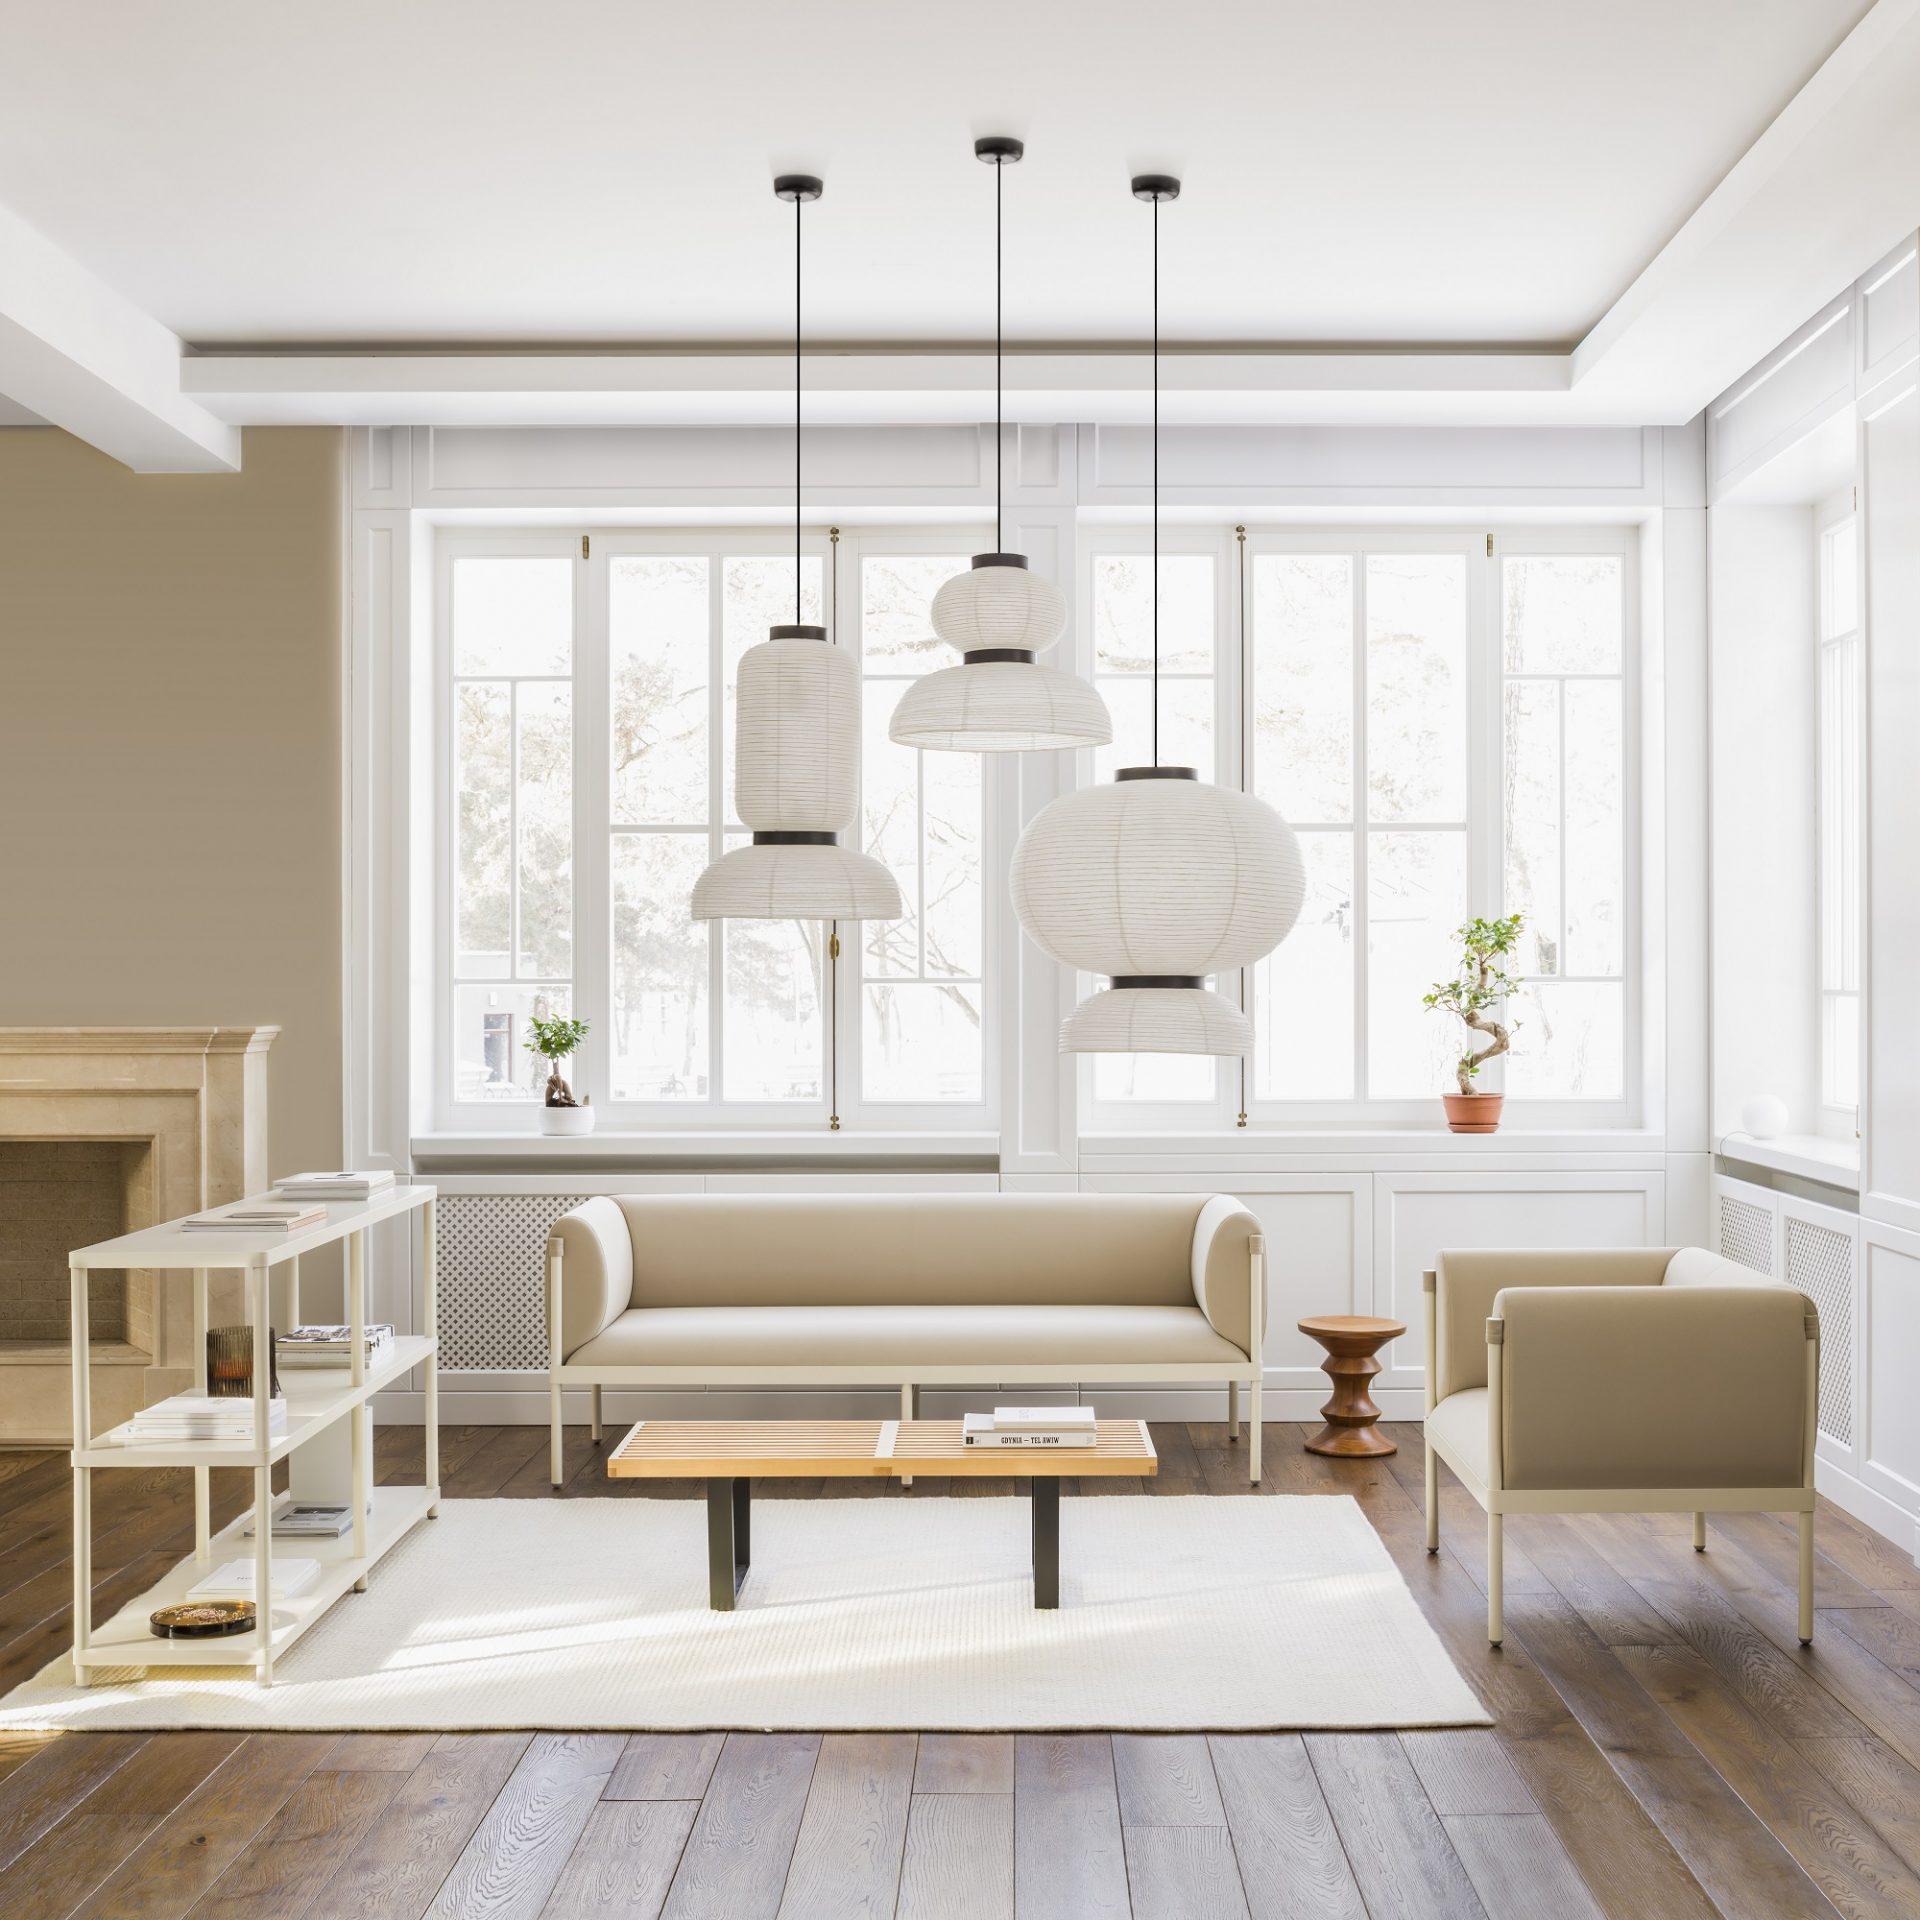 sofa-stilt-producent-mdd-projektant-form-us-with-love-1_51151139668_o